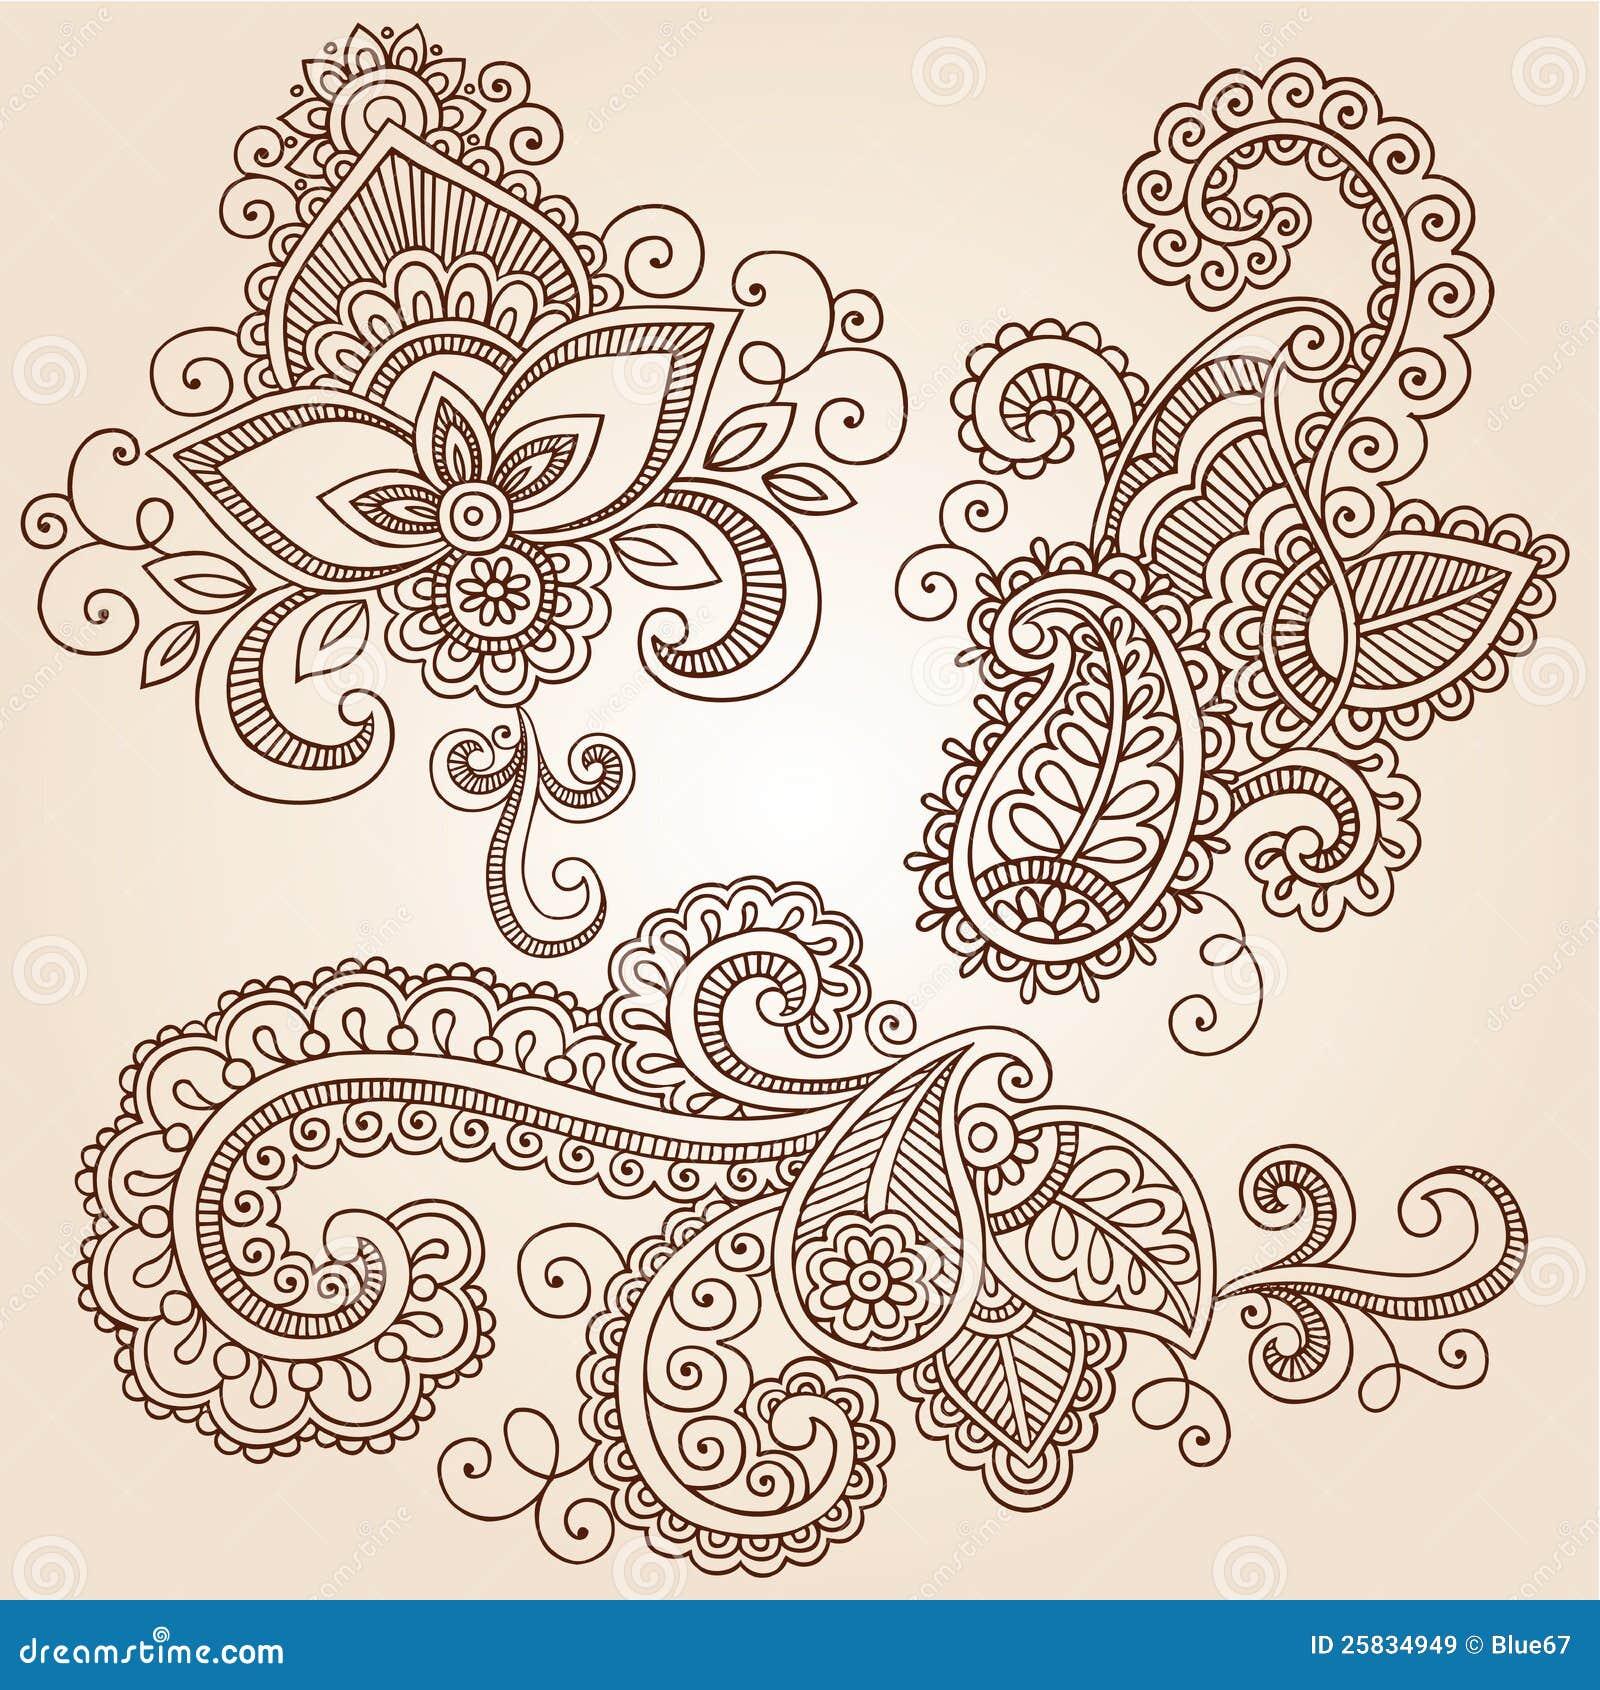 Henna Doodles Mehndi Tattoo Vector Design Elements Stock